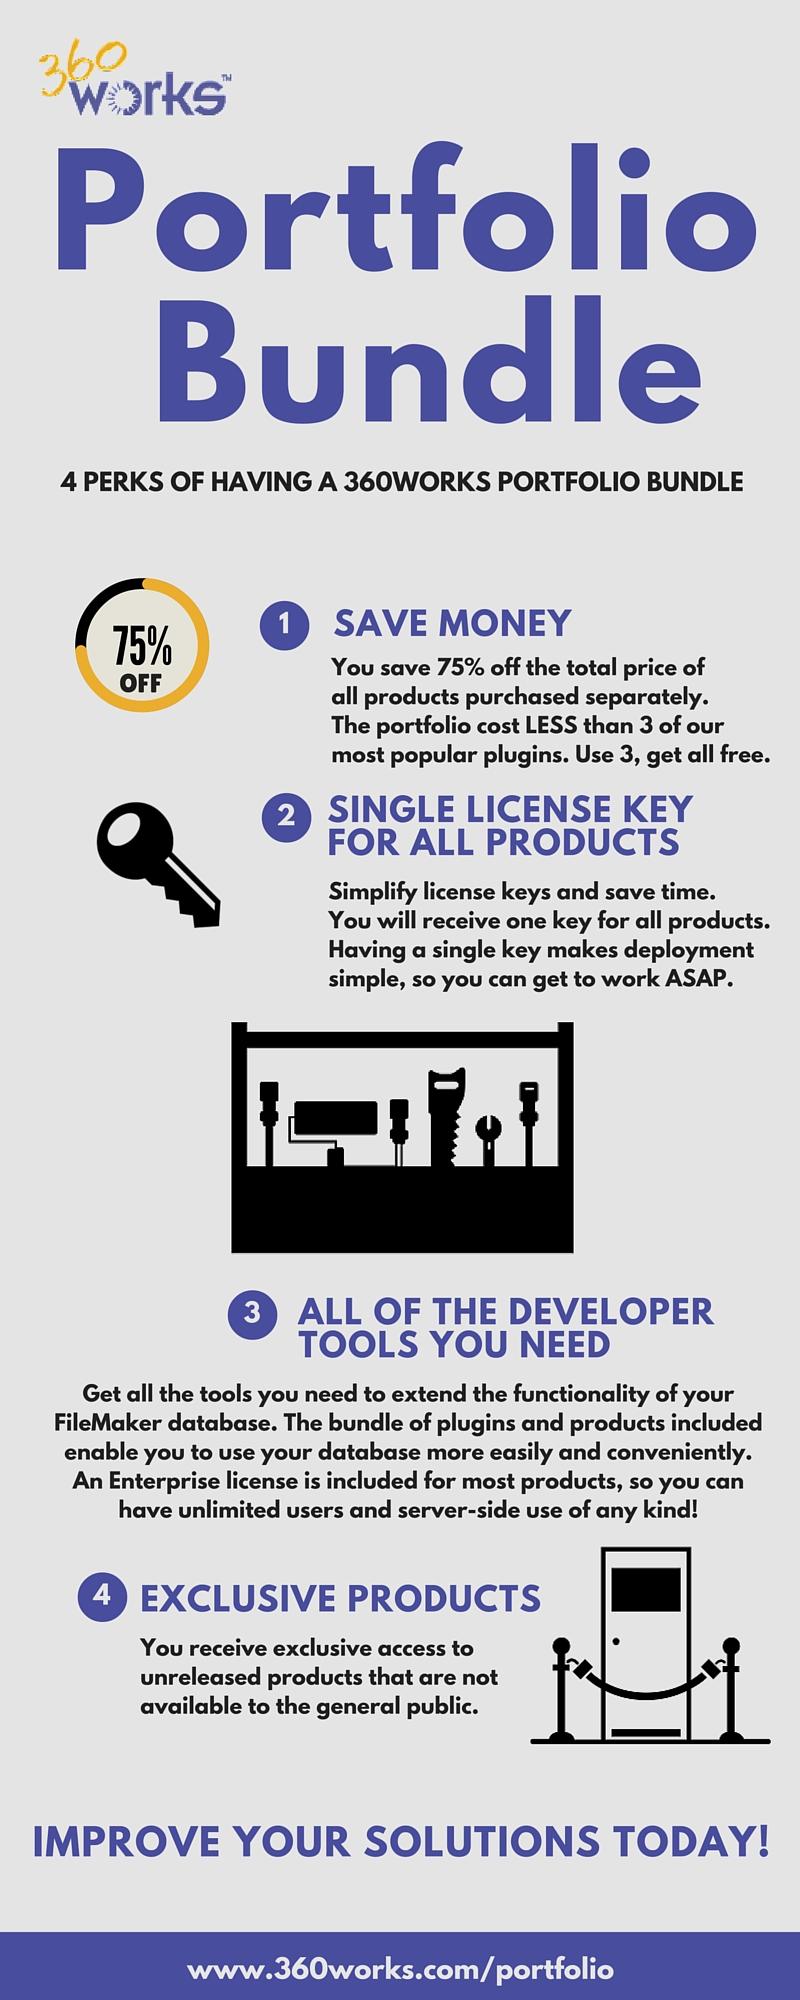 360works portfolio bundle infographic